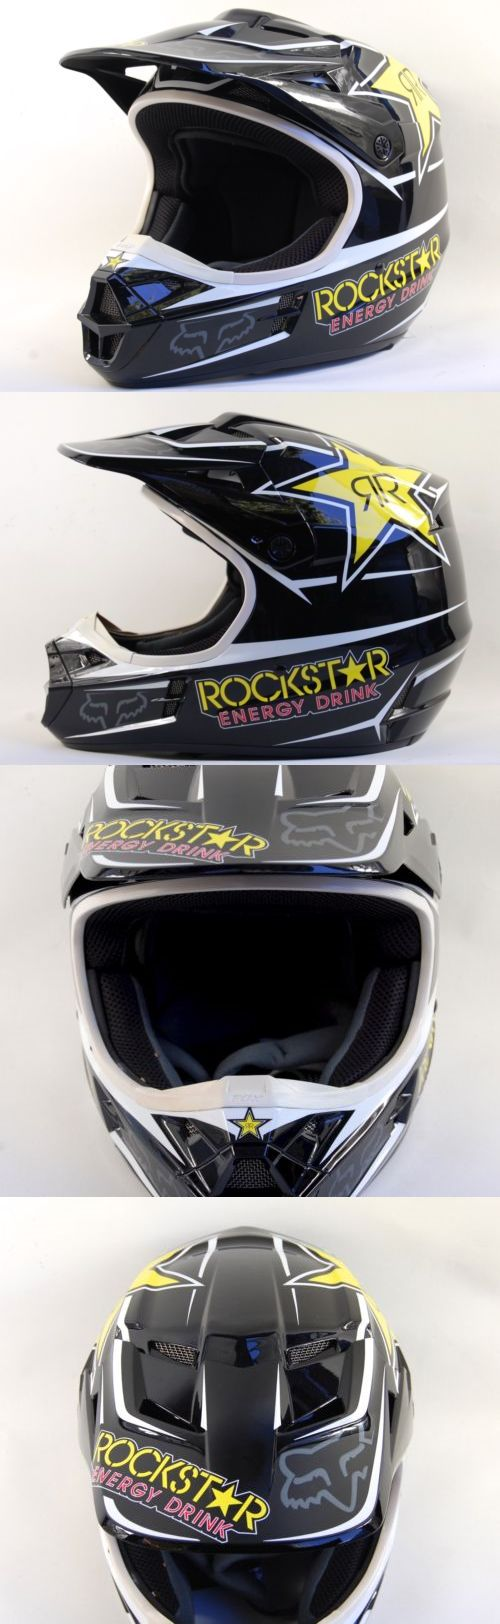 Helmet Accessories 177865: Fox Racing Dot Bmx Rockstars Mens Motocross Snell Helmet Size Medium 7 1/8-7 1/4 BUY IT NOW ONLY: $149.99